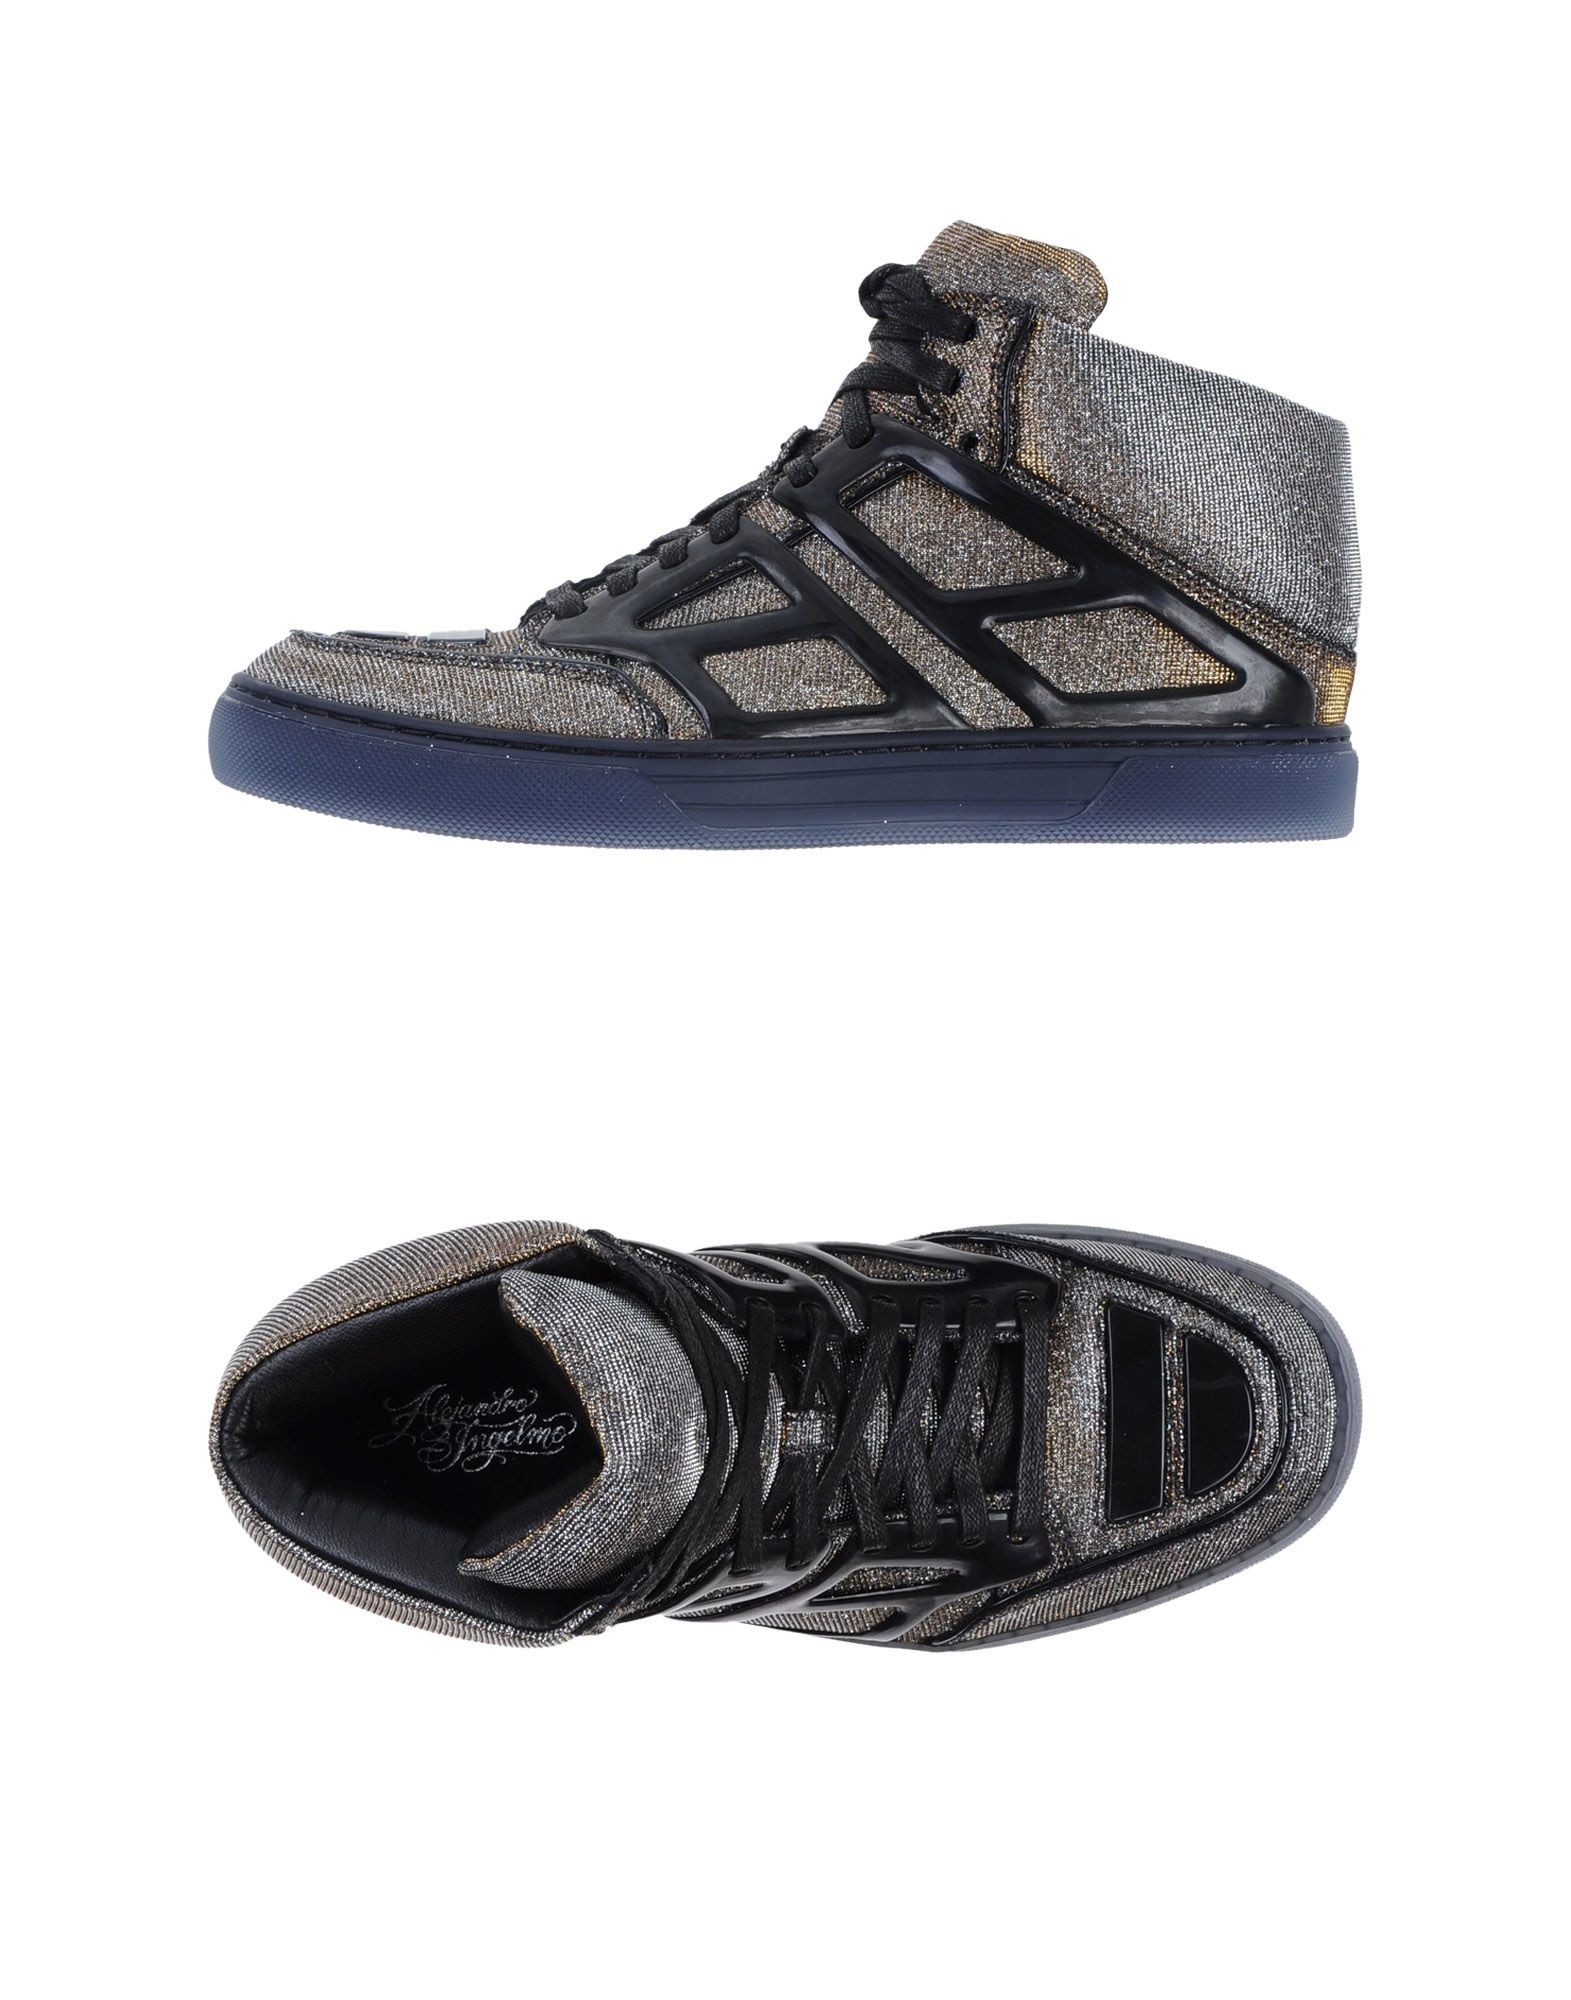 Alejandro Ingelmo Shoes Men